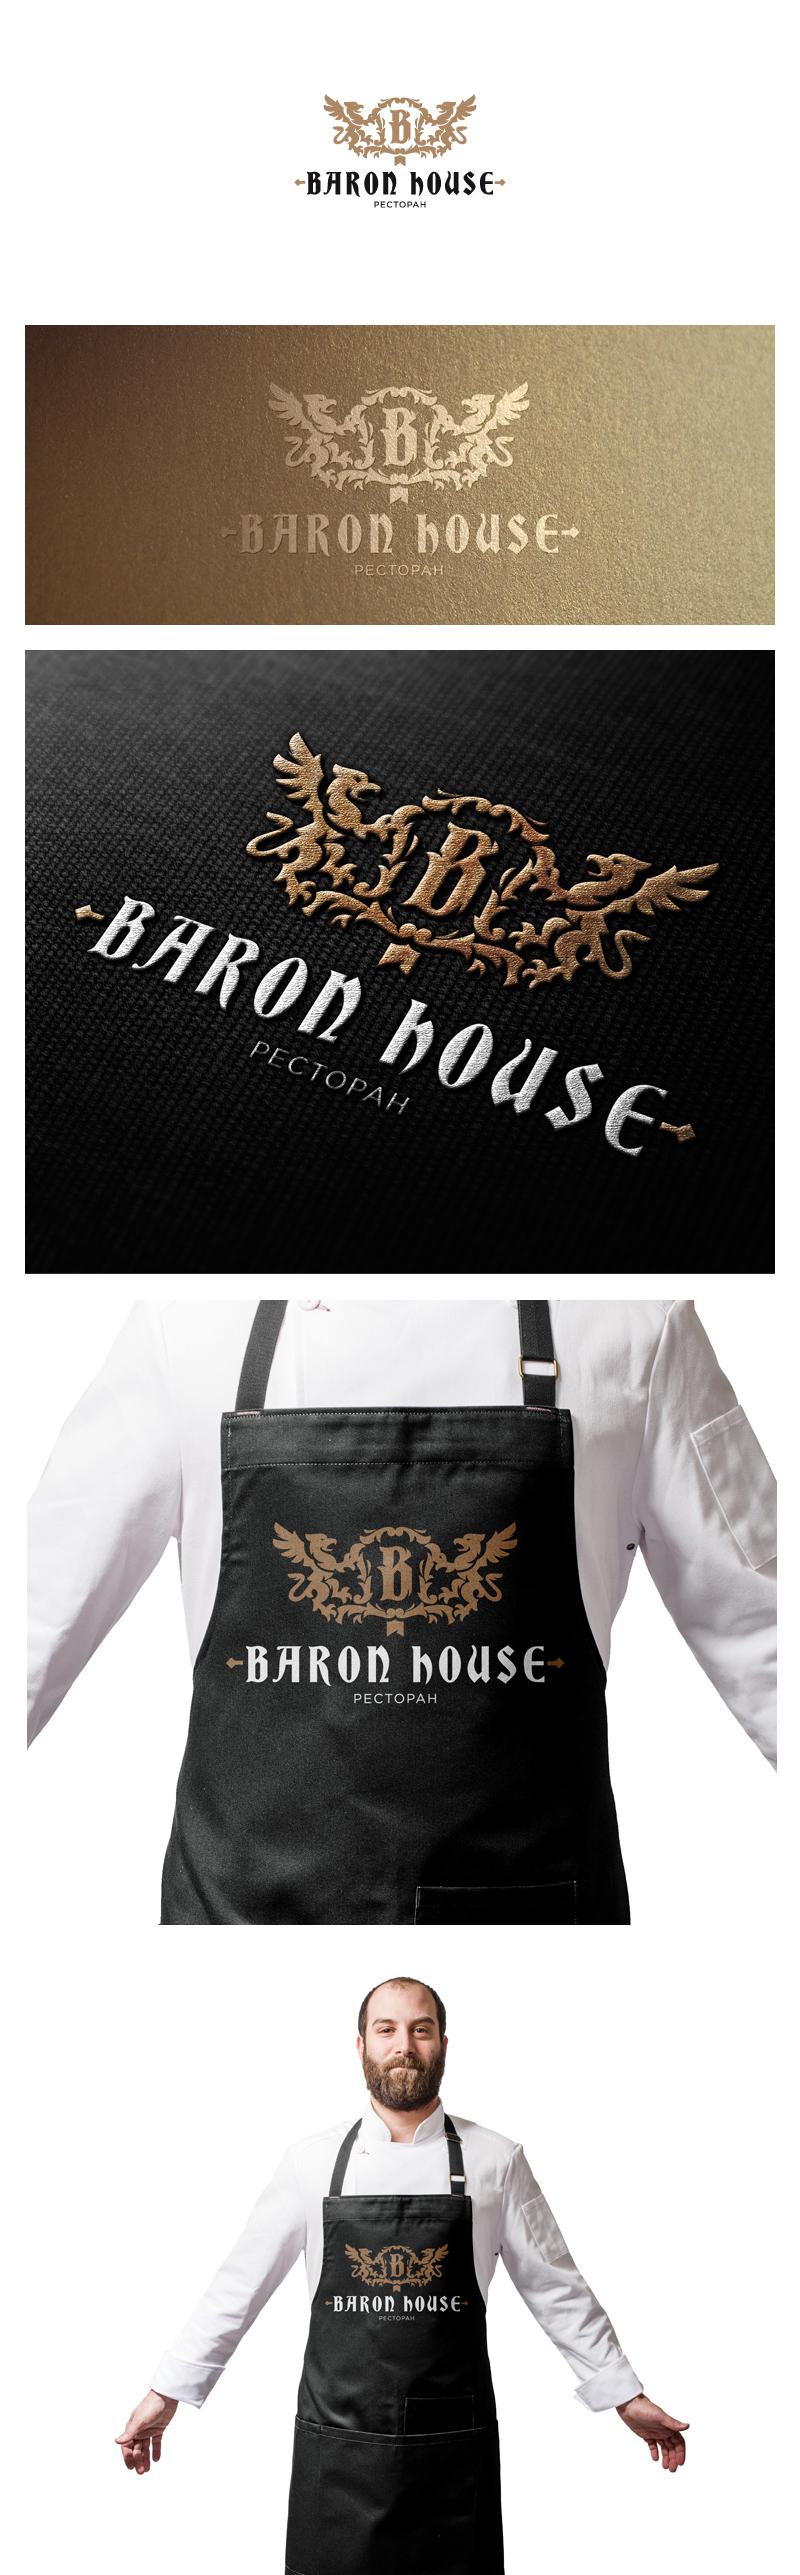 Baron House